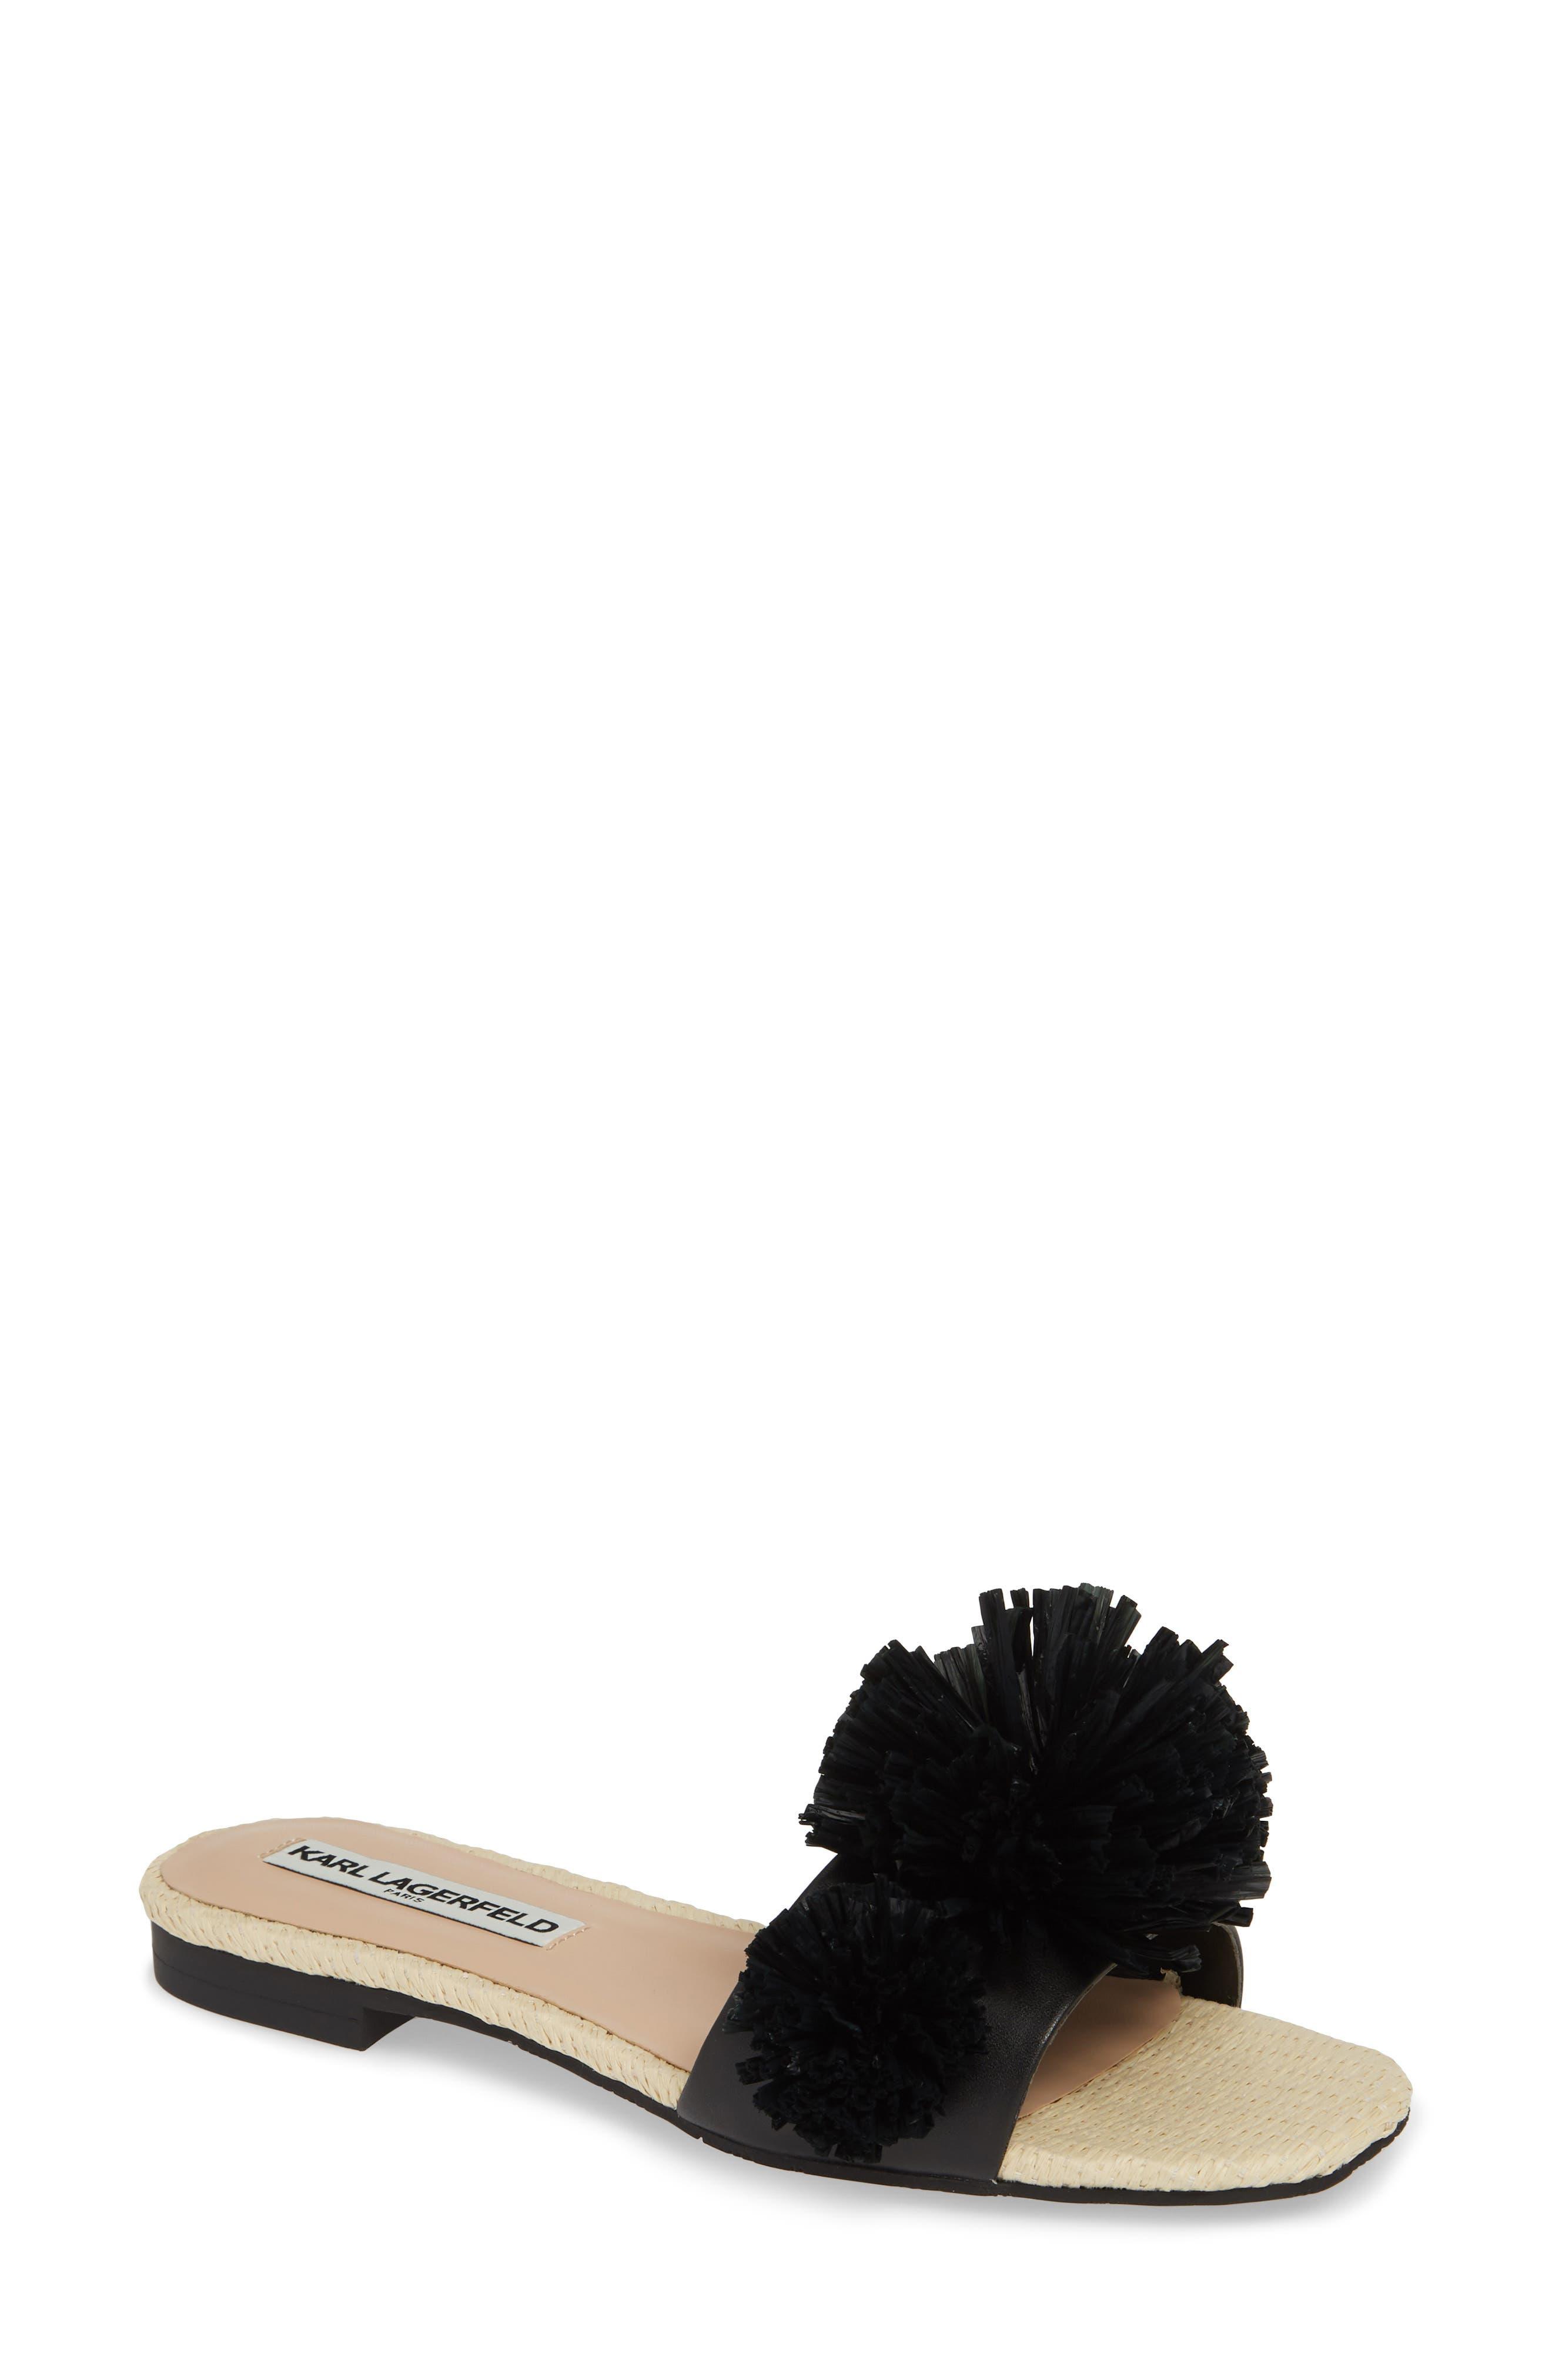 Rainey Slide Sandal, Main, color, BLACK LEATHER